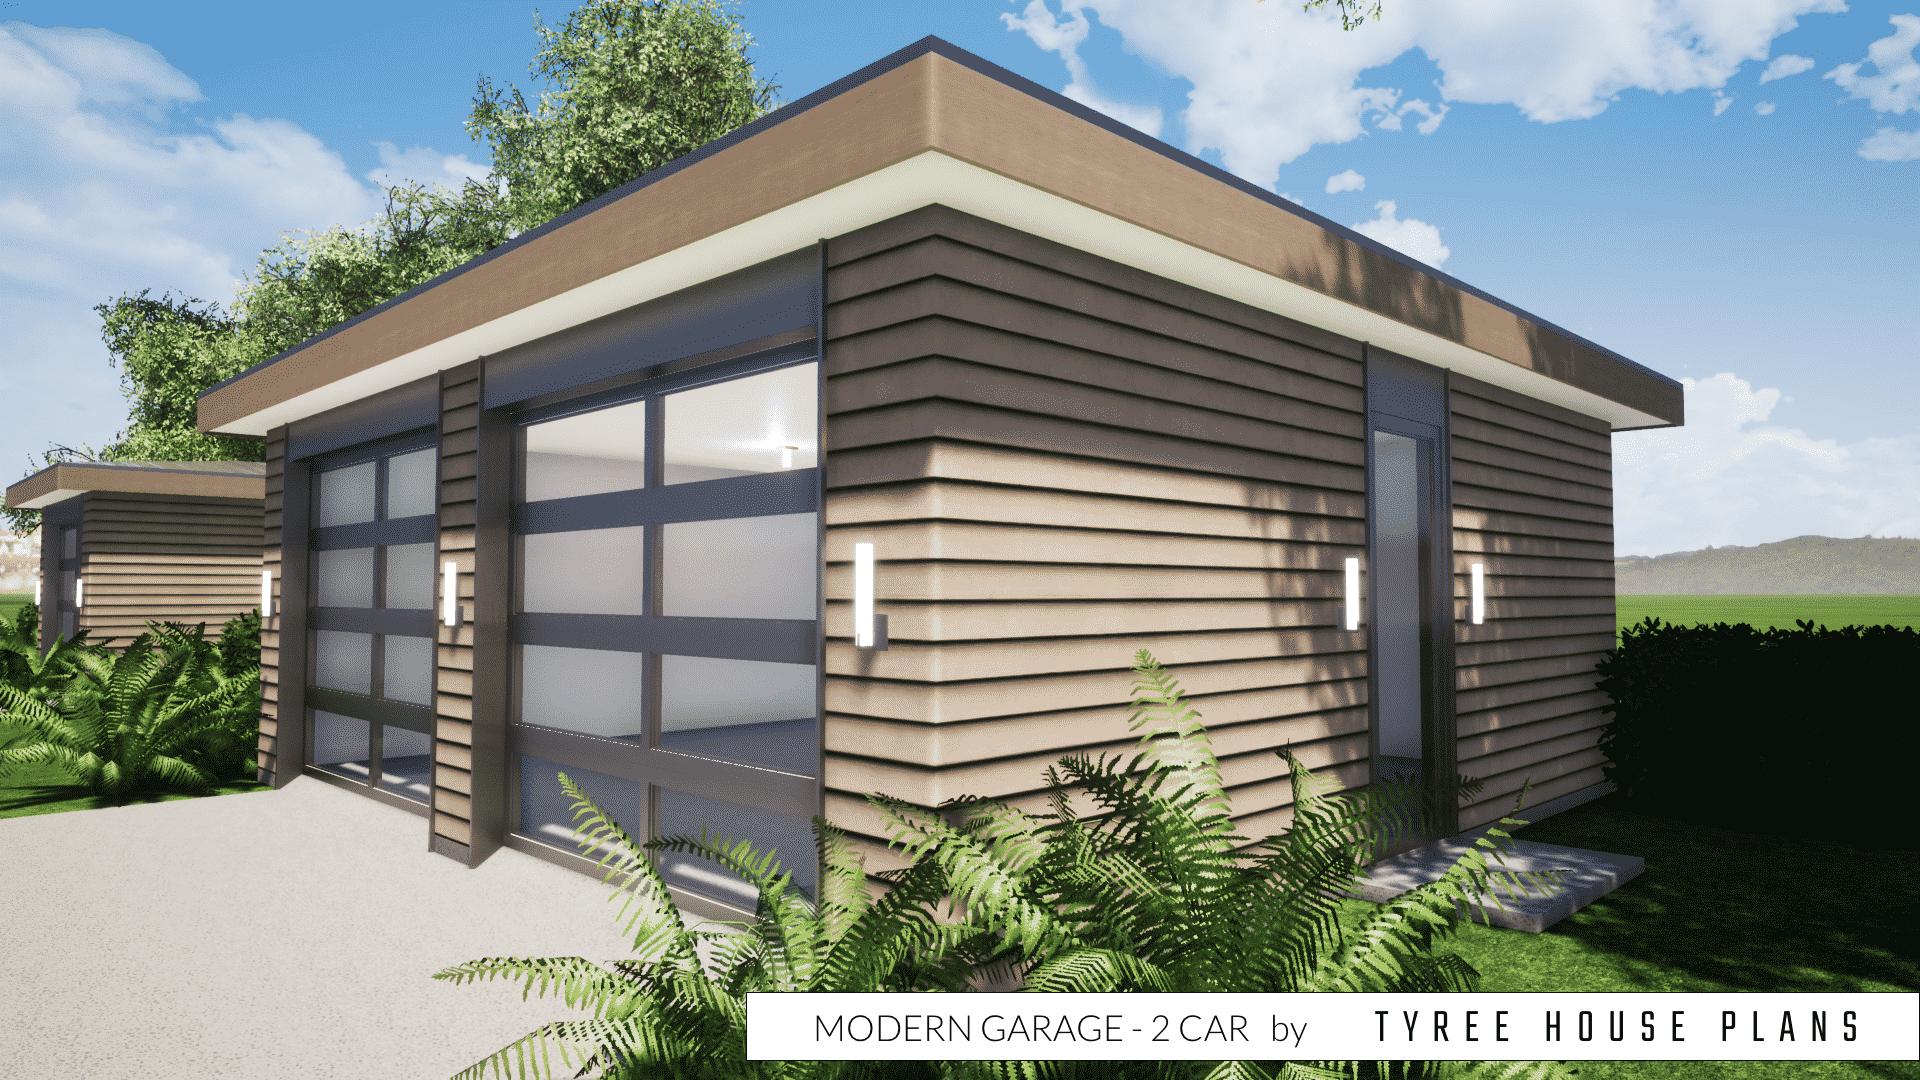 Modern Garage Plan - 2 Car by Tyree House Plans